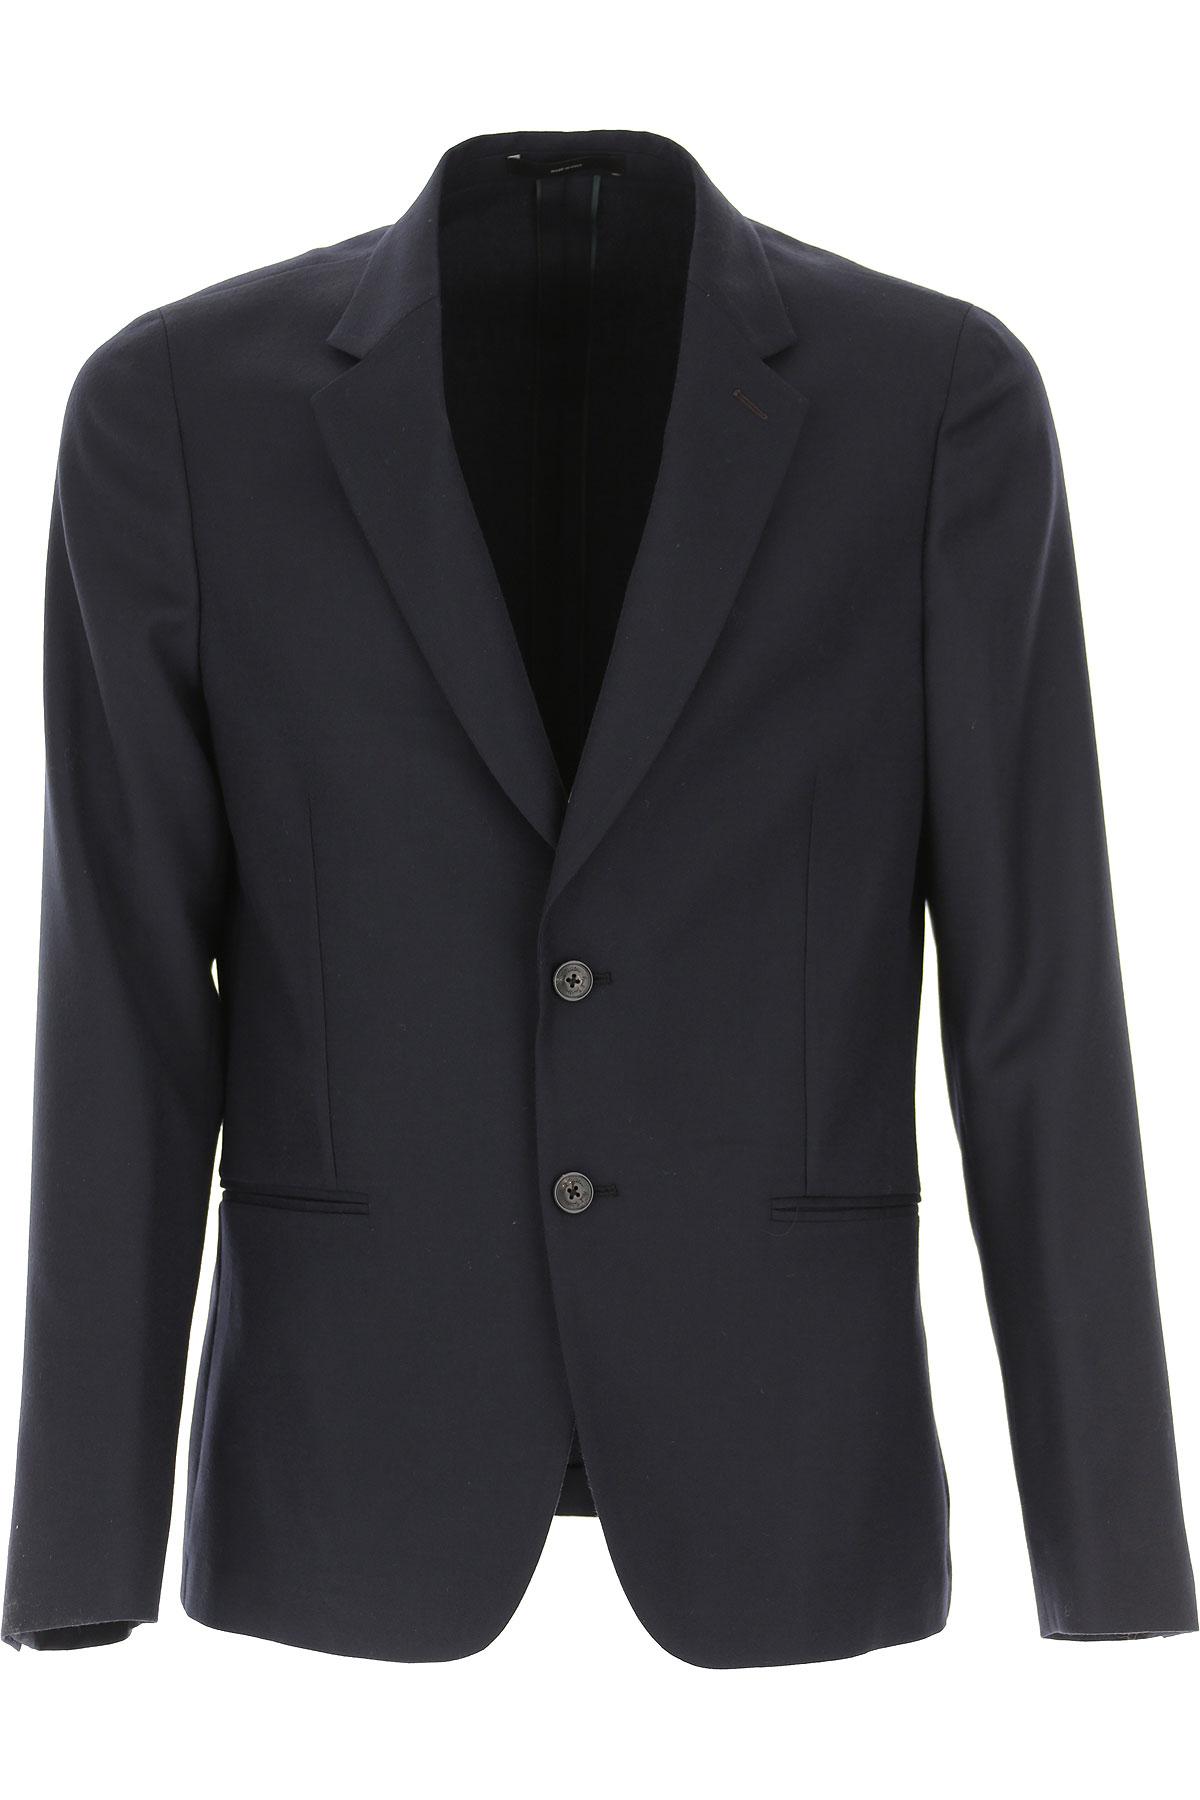 Paul Smith Blazer for Men, Sport Coat On Sale, Black, Wool, 2019, L M XL XXL